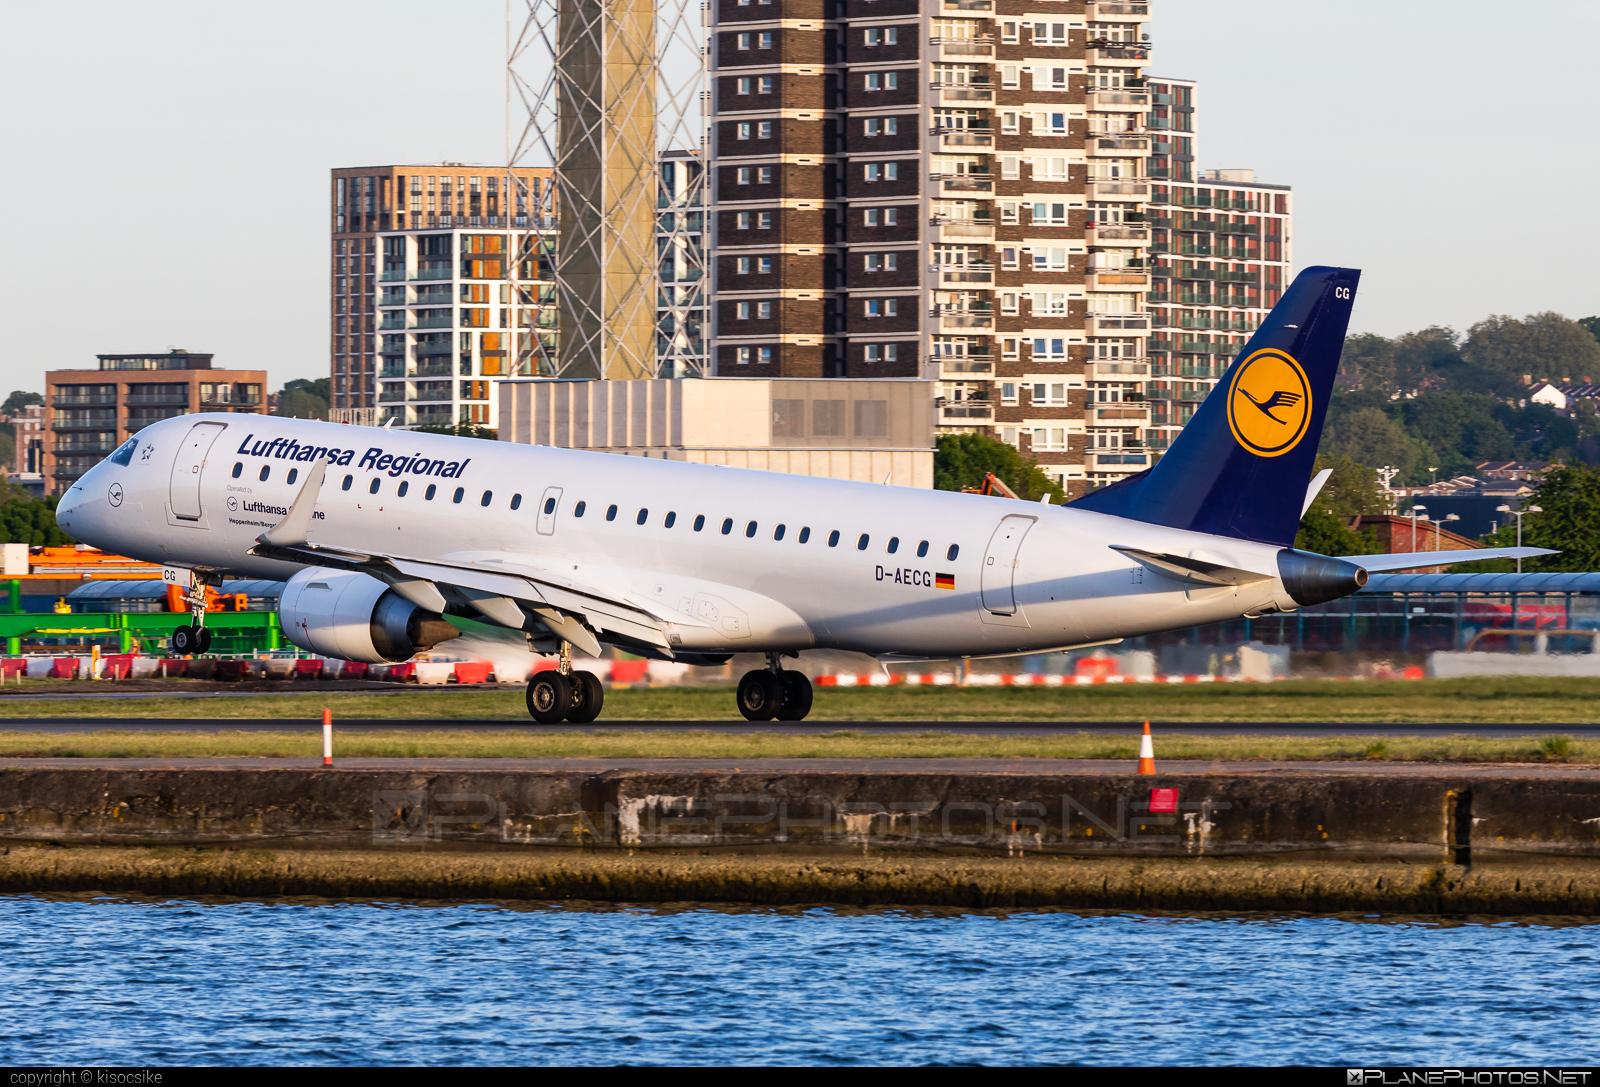 Embraer E190LR (ERJ-190-100LR) - D-AECG operated by Lufthansa CityLine #e190 #e190100 #e190100lr #e190lr #embraer #embraer190 #embraer190100lr #embraer190lr #lufthansa #lufthansacityline